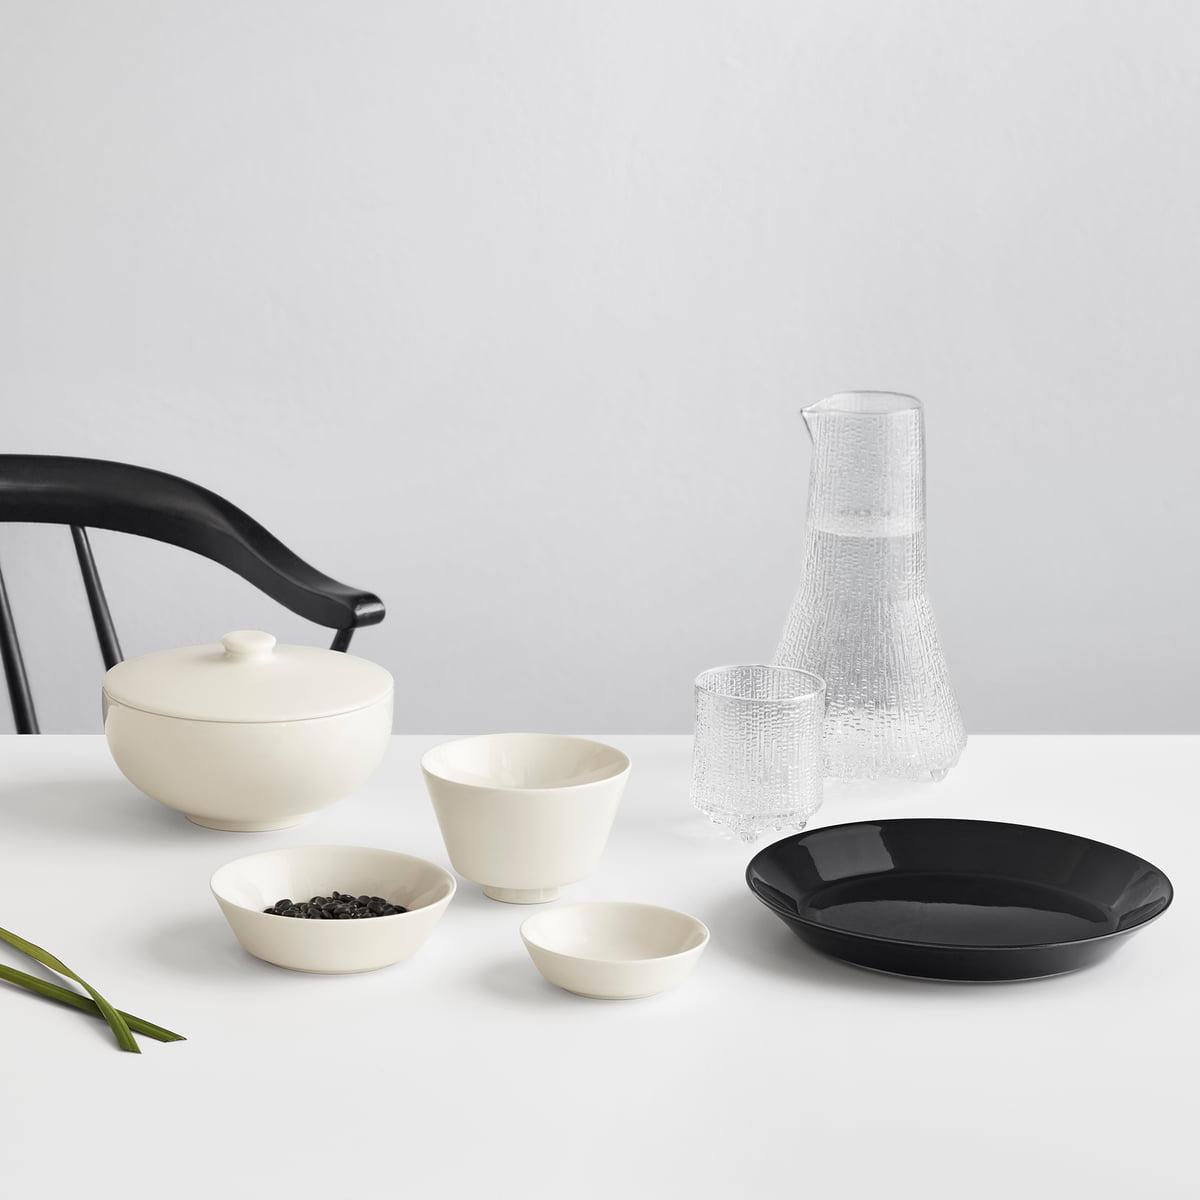 teema tiimi white by iittala connox shop. Black Bedroom Furniture Sets. Home Design Ideas